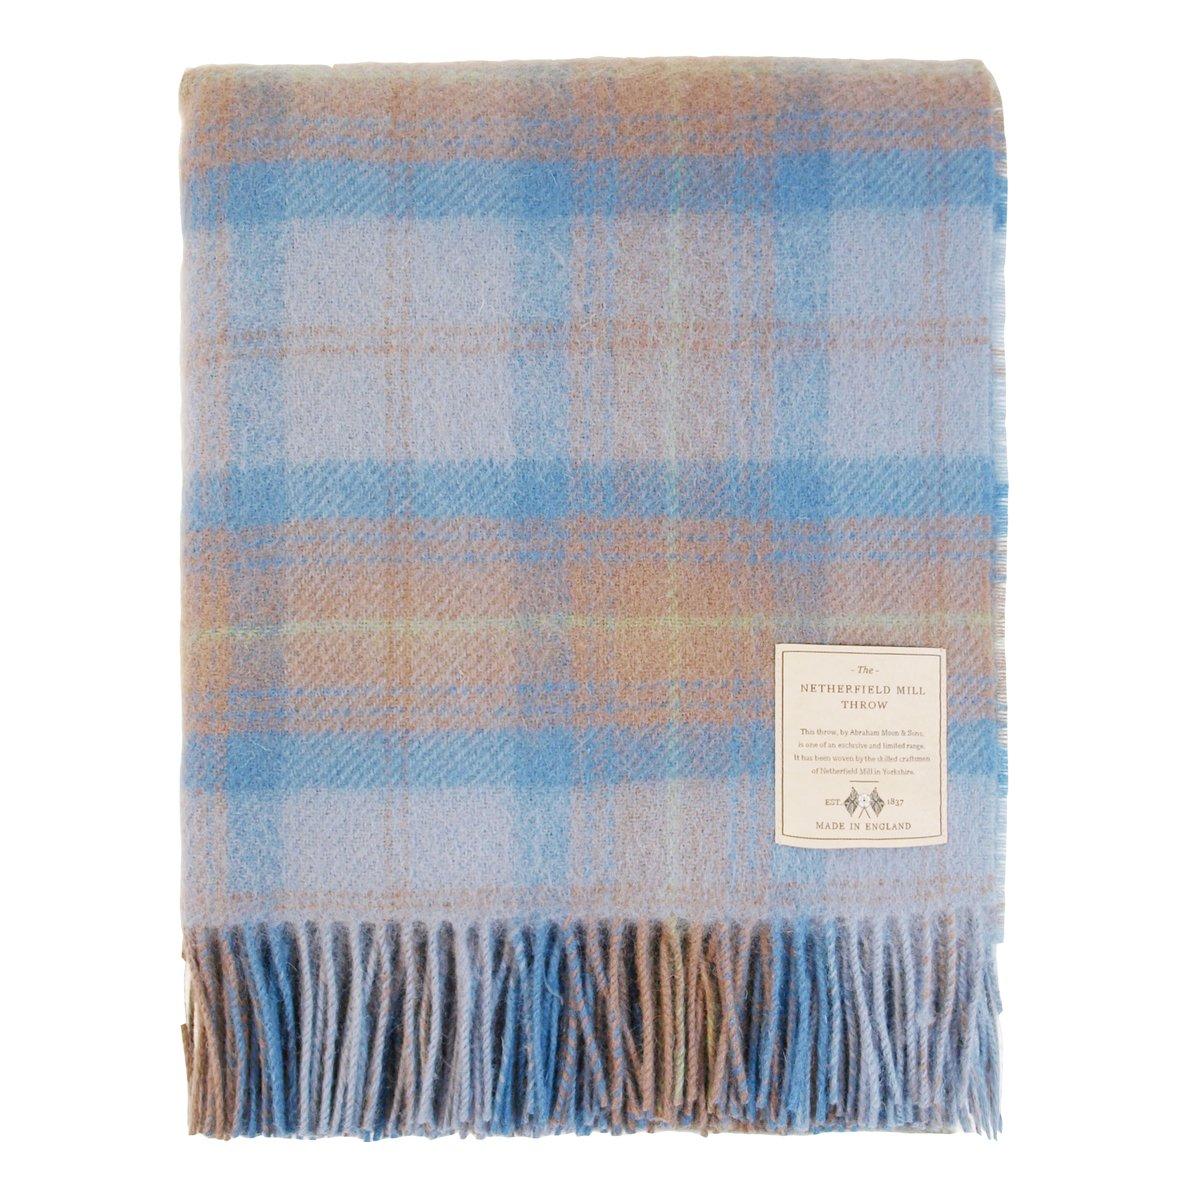 British Wool Throw Blue-Green ONE